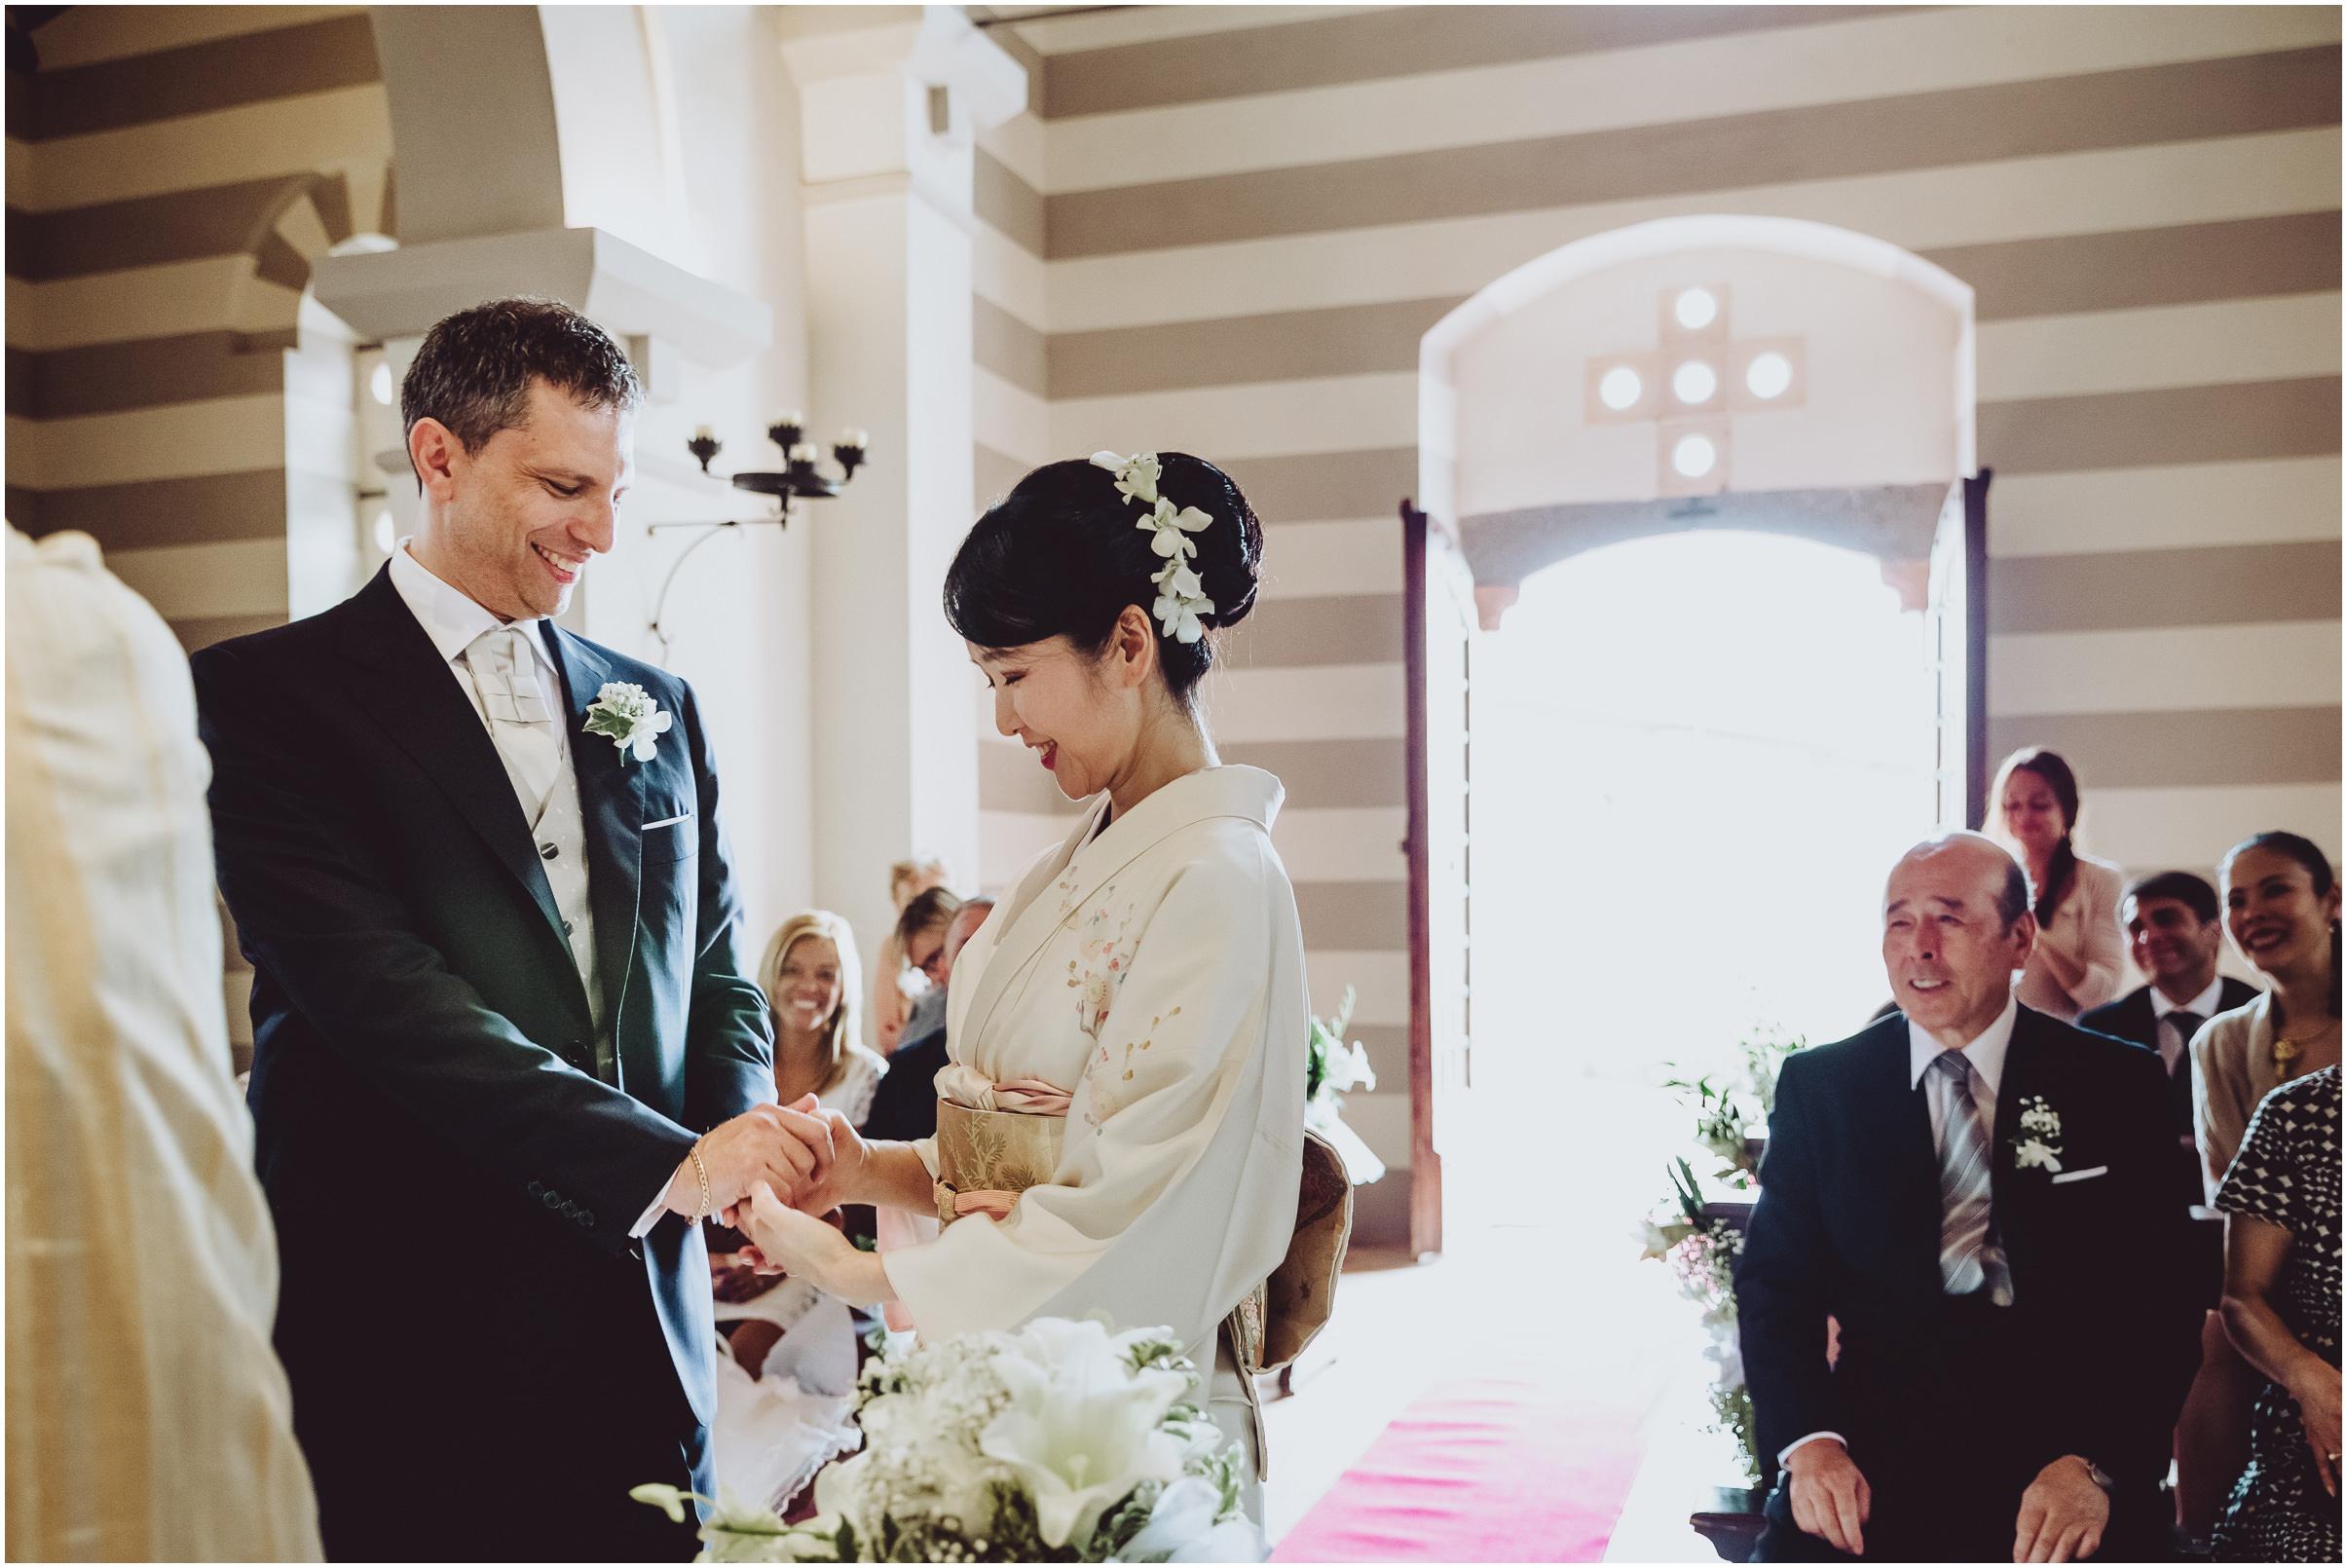 WEDDING-PHOTOGRAPHY-SARA-LORENZONI-FOTOGRAFIA-MATRIMONIO-ORVIETO-JUKA-ANTONELLO19